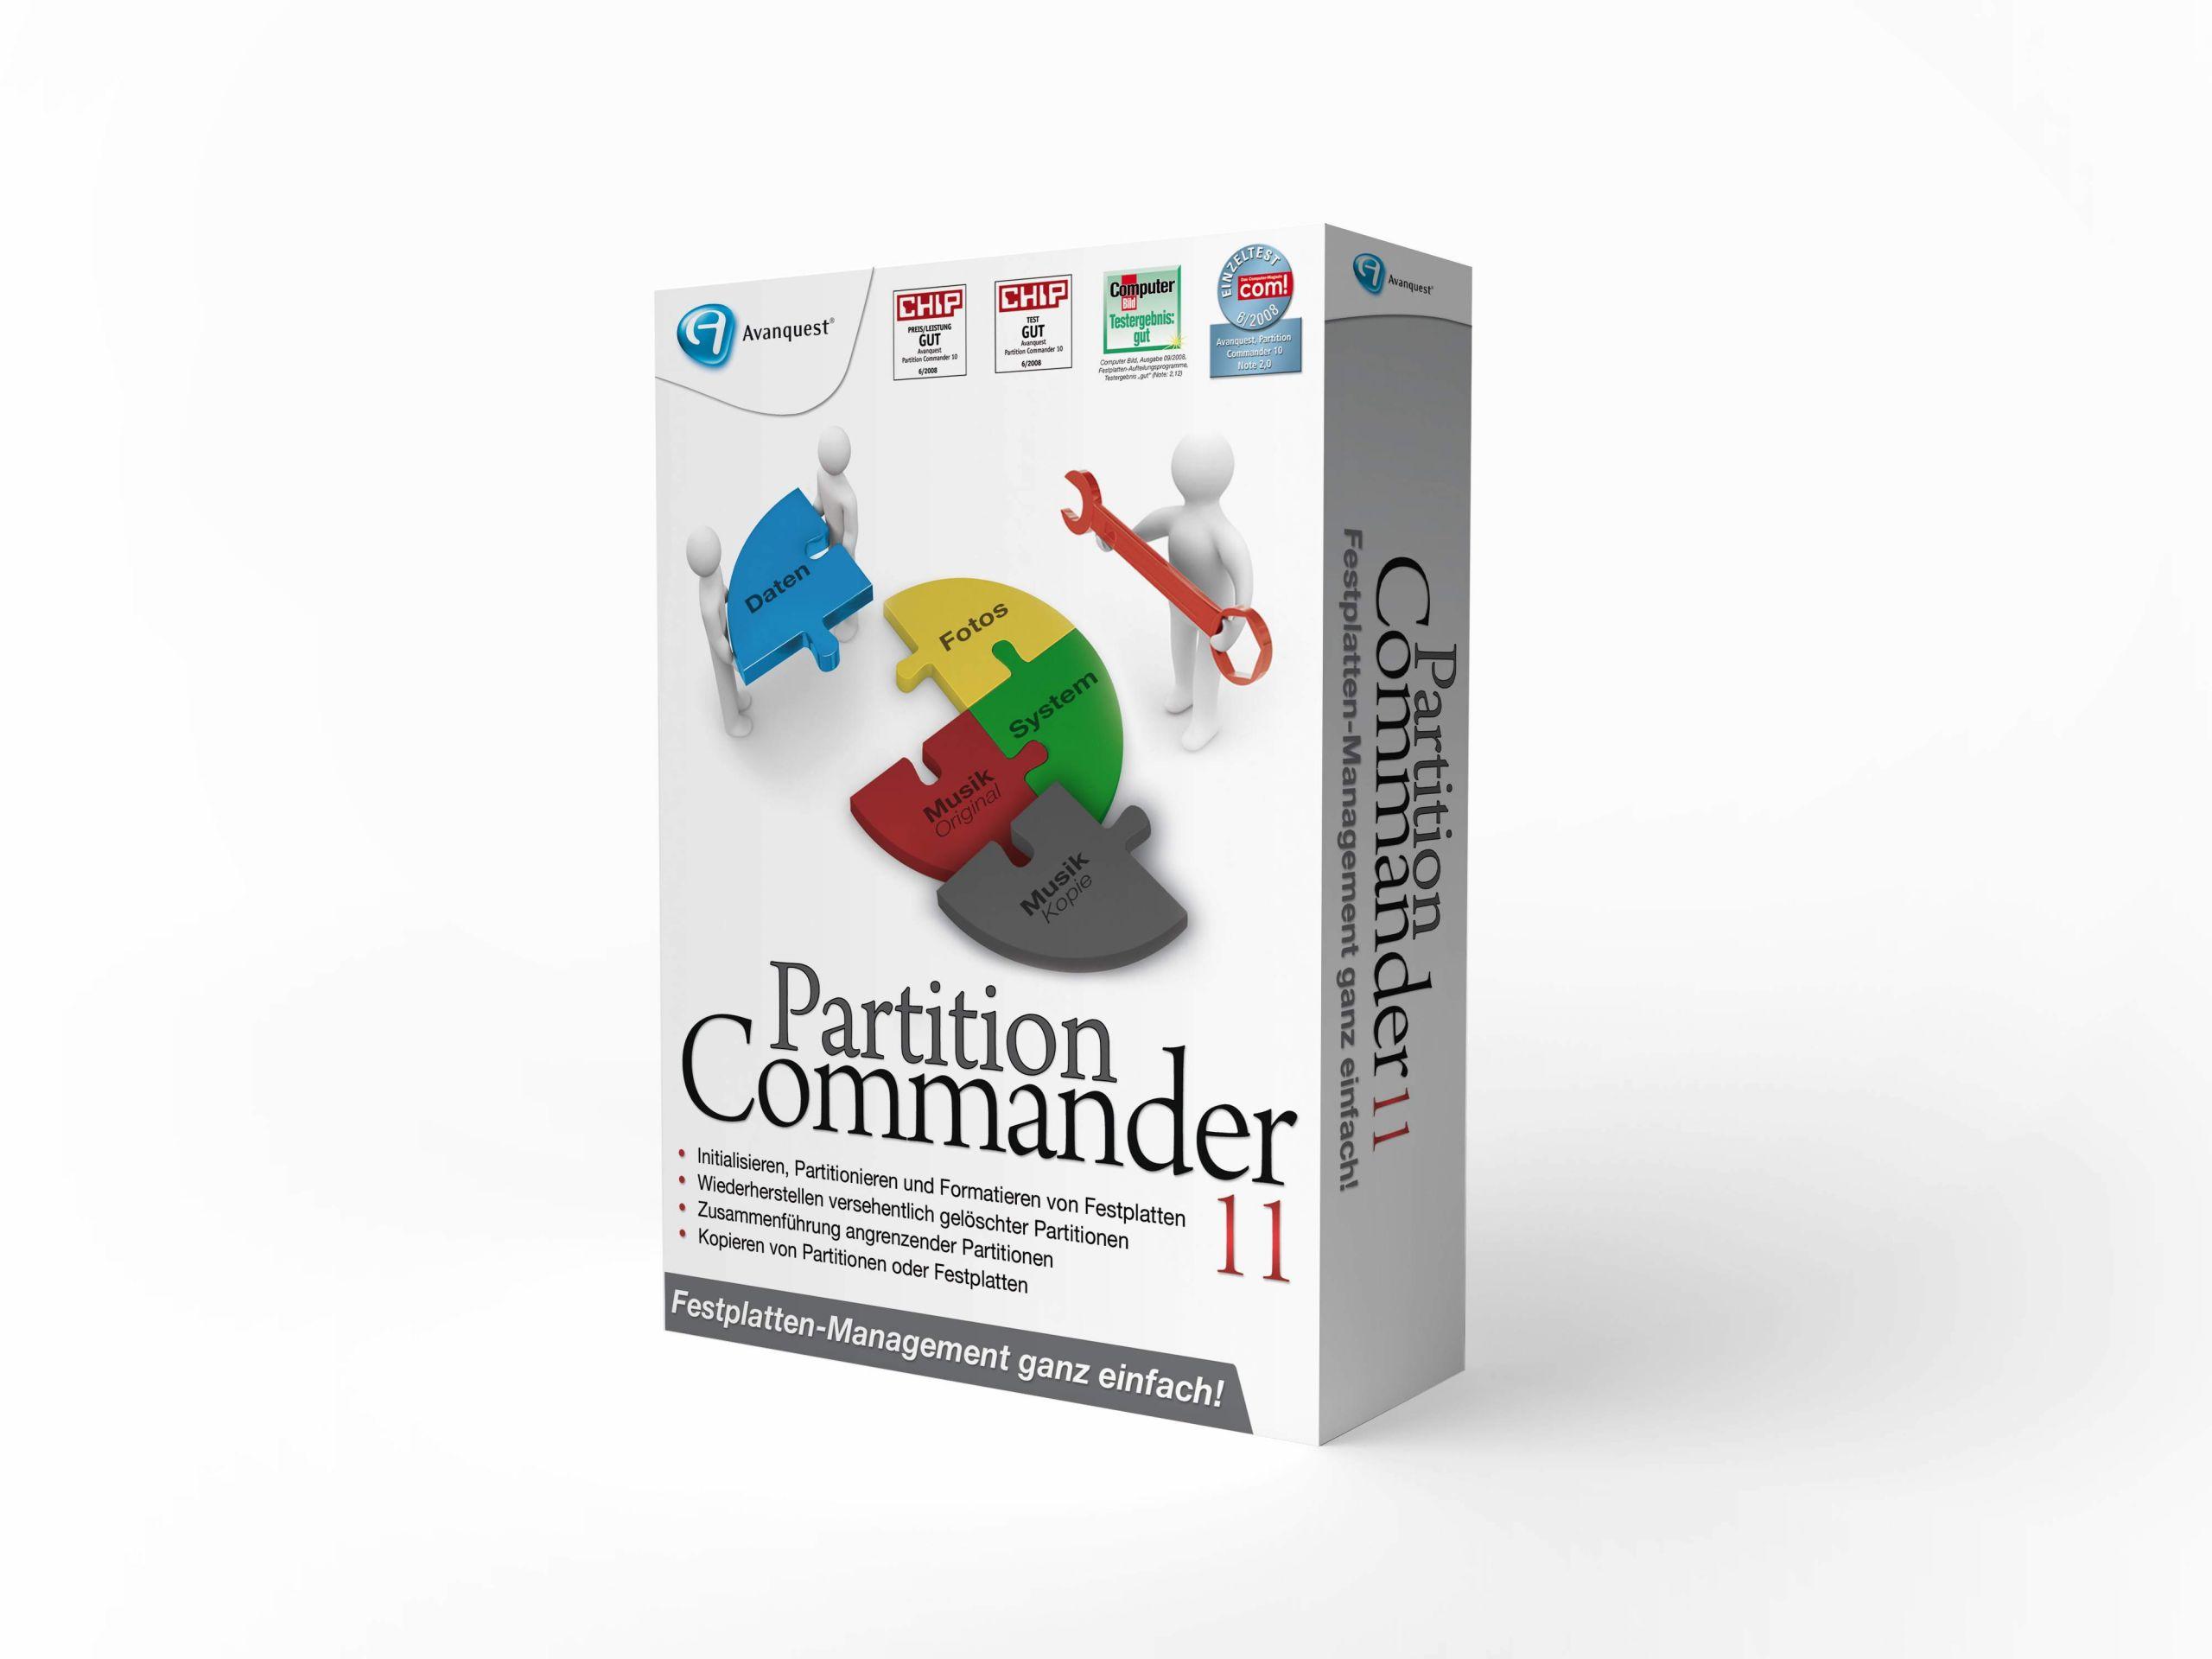 partition mander 11 3d front rechts 300dpi rgb